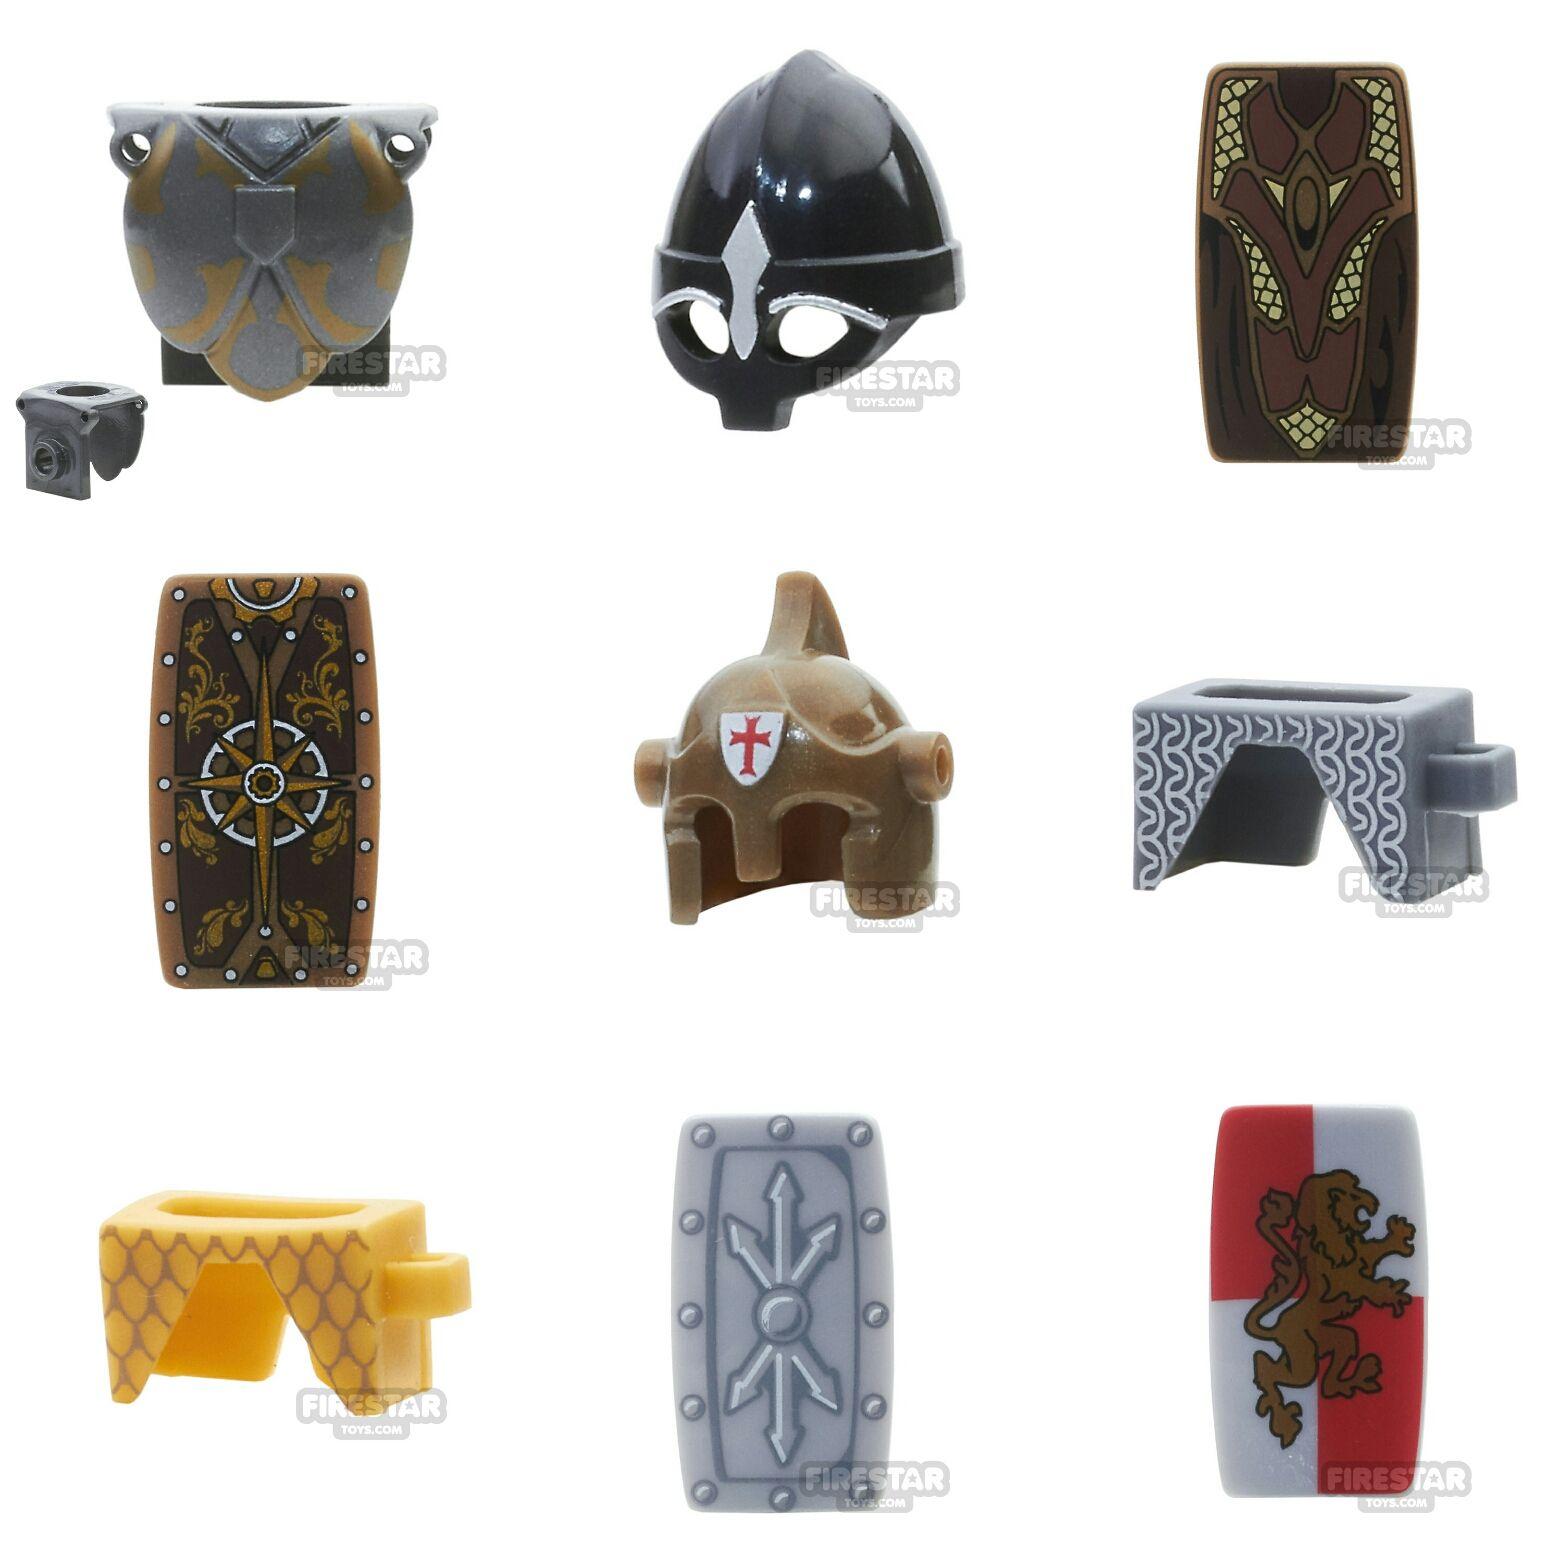 New Brickforge LEGO minifigure armour shields and helmets